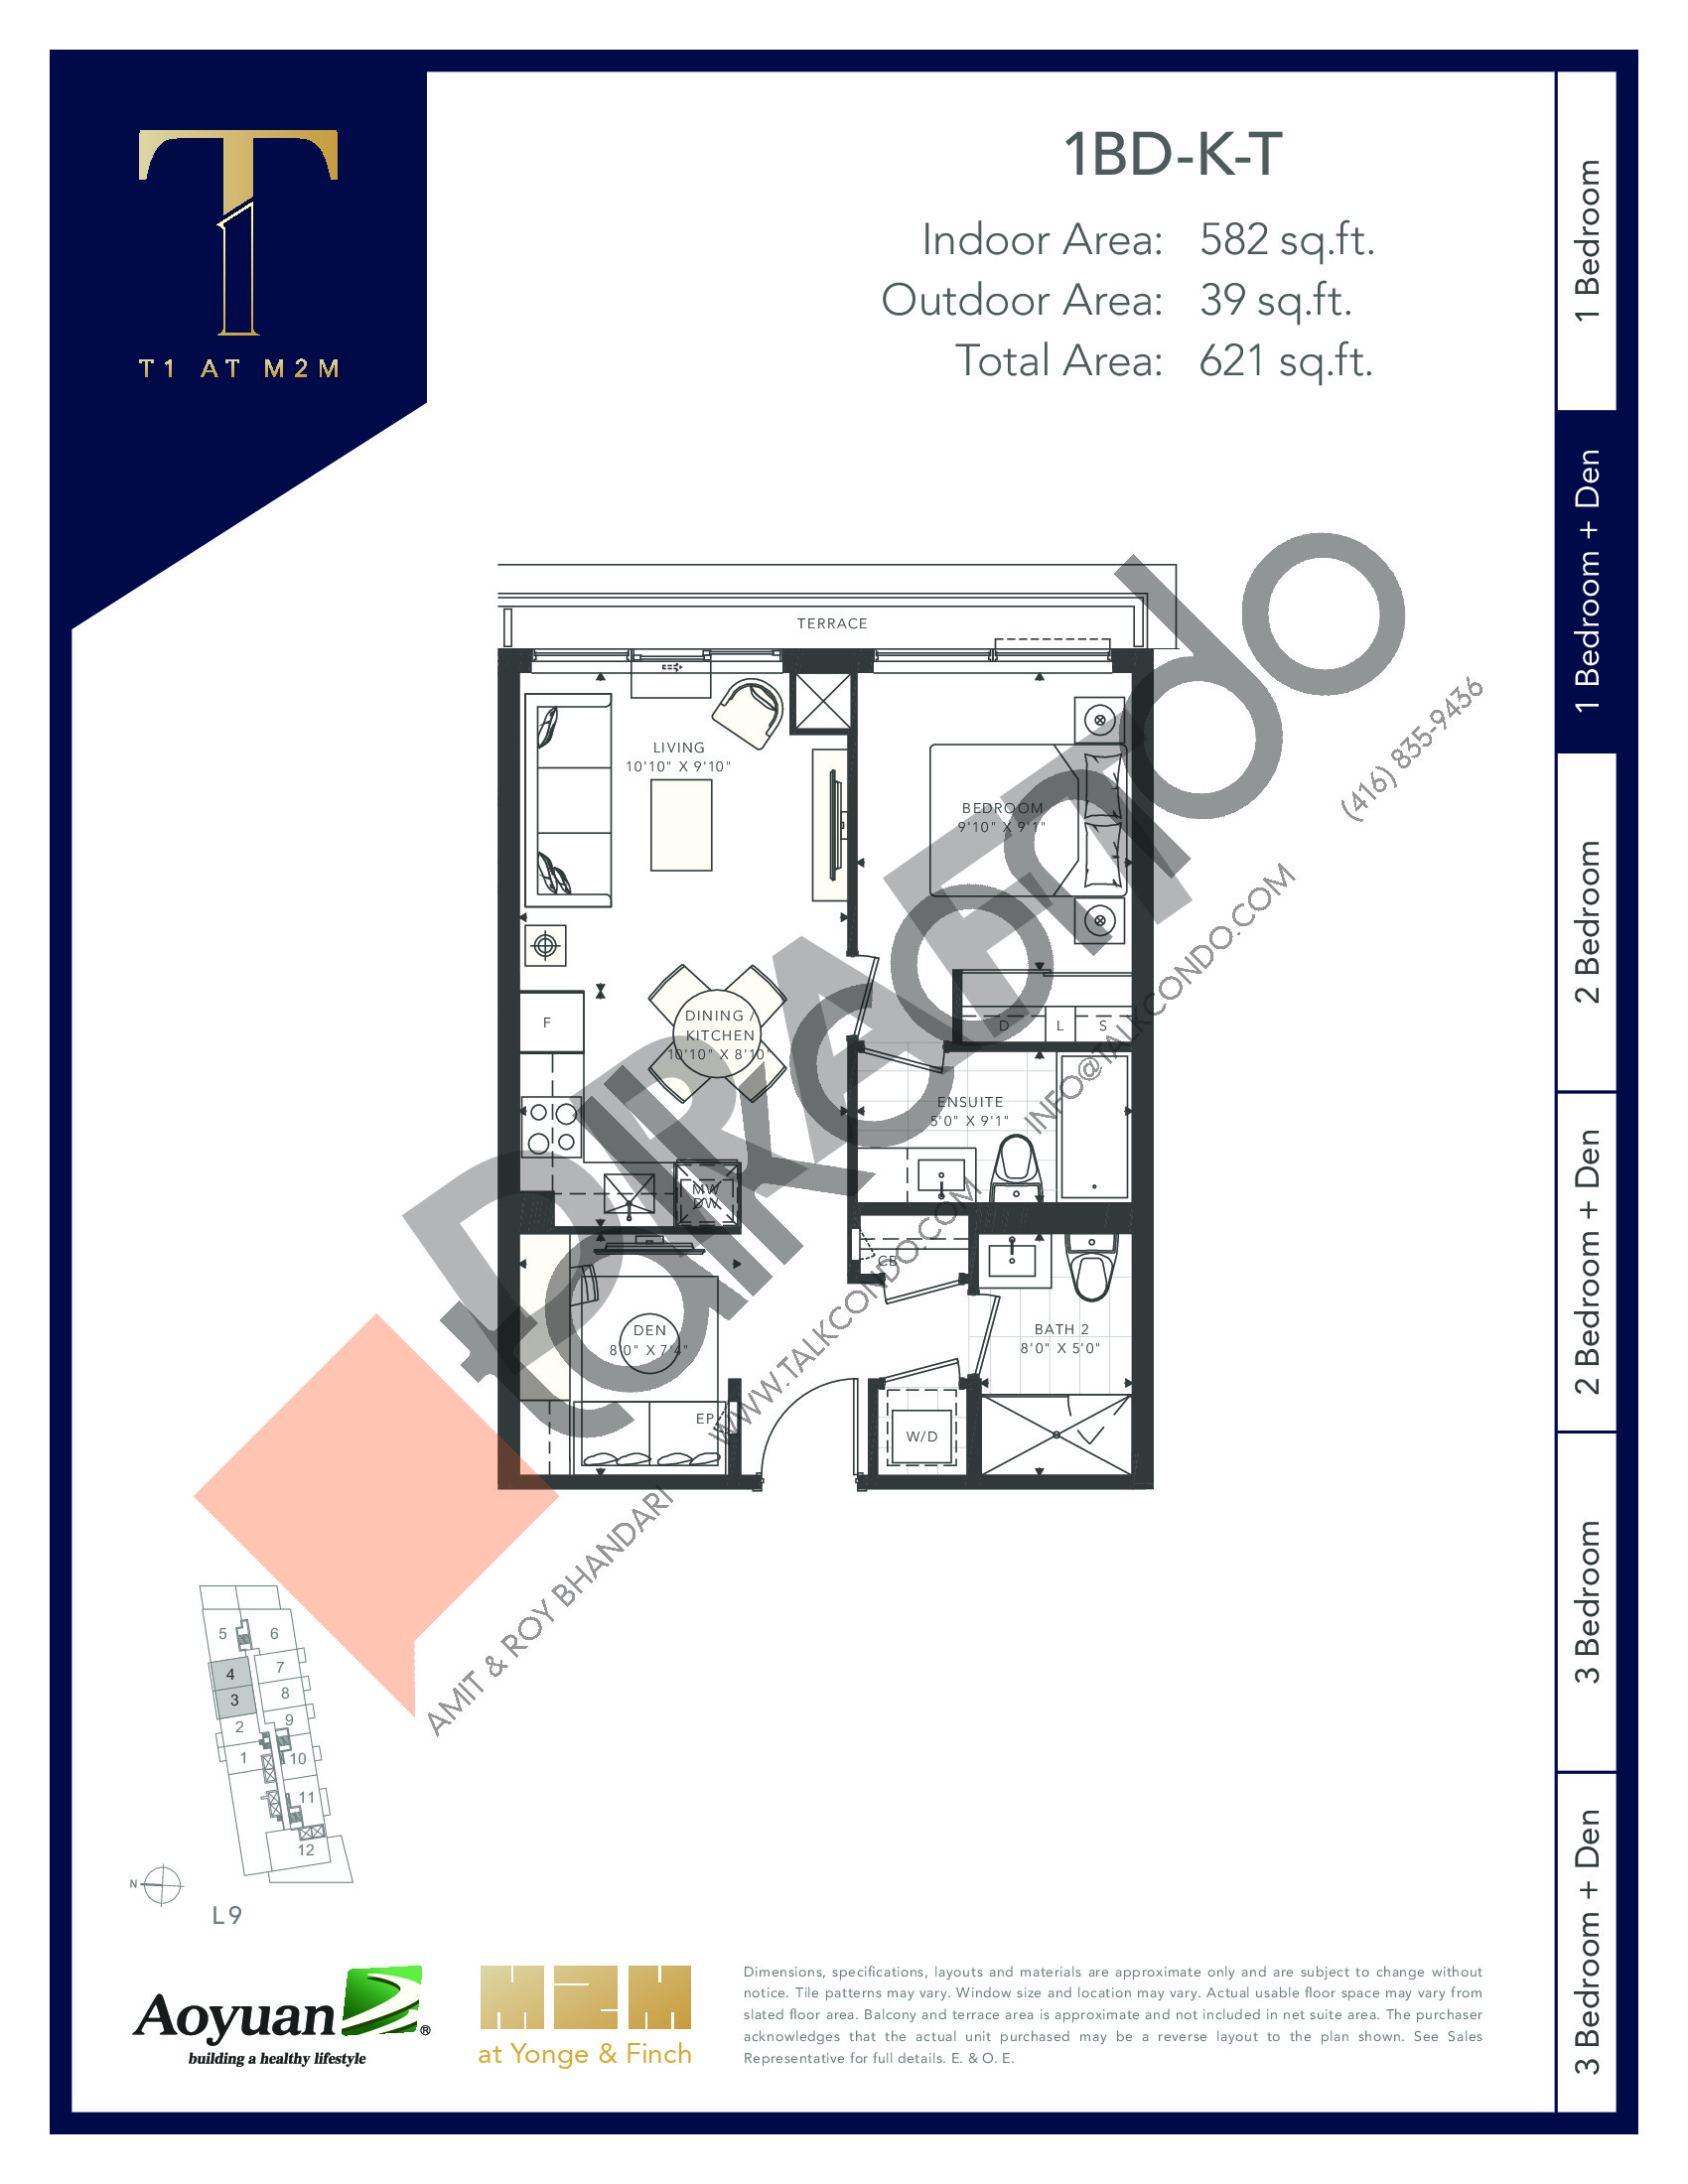 1BD-K-T (Podium) Floor Plan at T1 at M2M Condos - 582 sq.ft